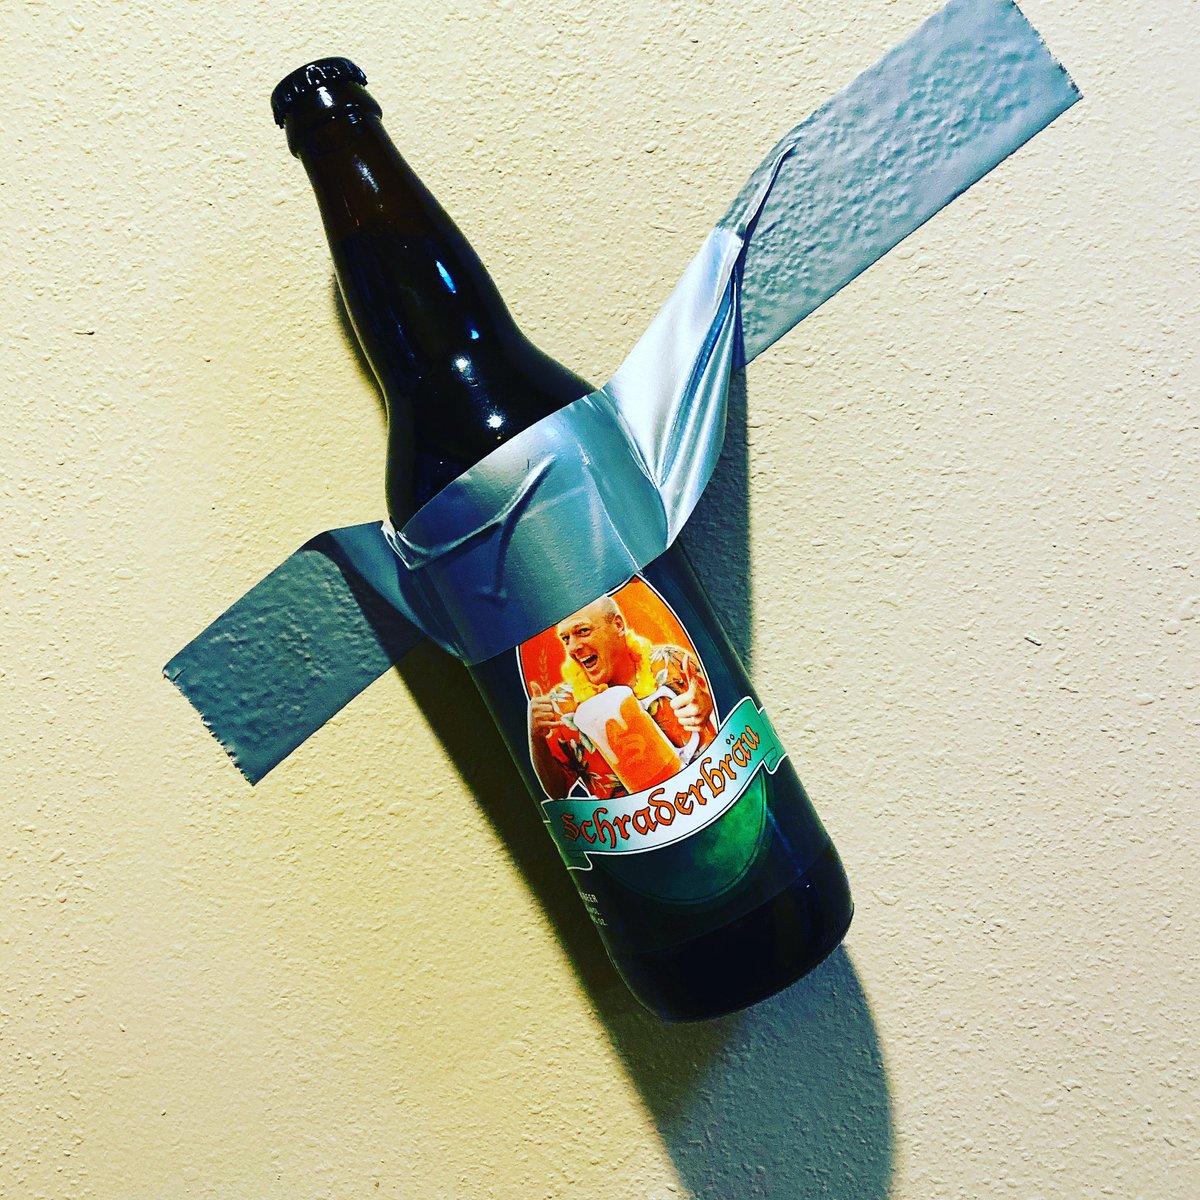 Jesus Christ Marie, it's not just beer it's art! @Schraderbrau_BB @ArtBasel @figmtnbrew<br>http://pic.twitter.com/klljPyv5ke